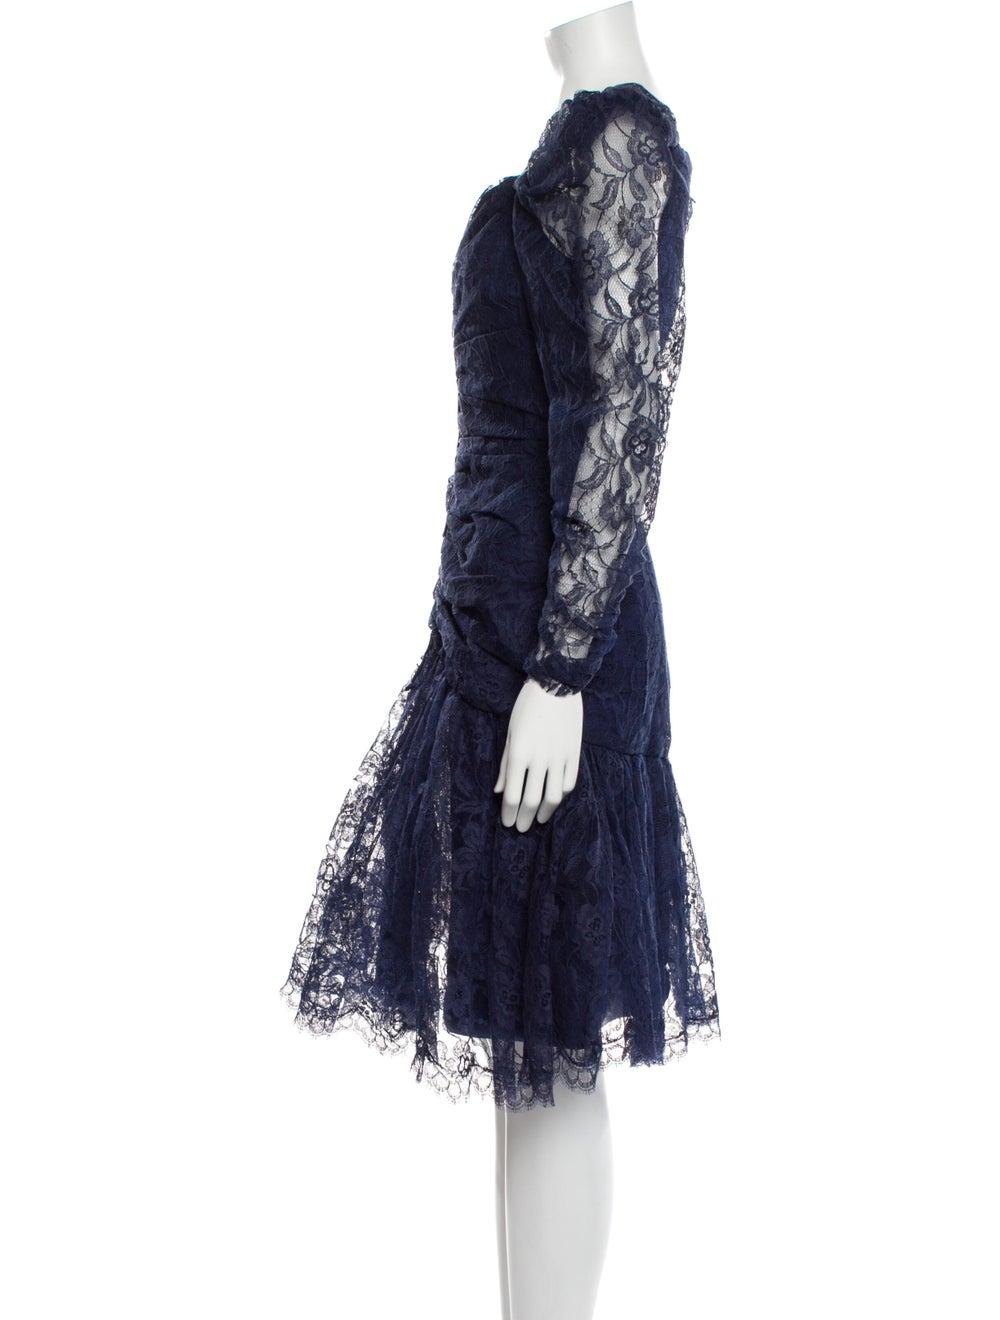 Arnold Scaasi Vintage Knee-Length Dress Blue - image 2